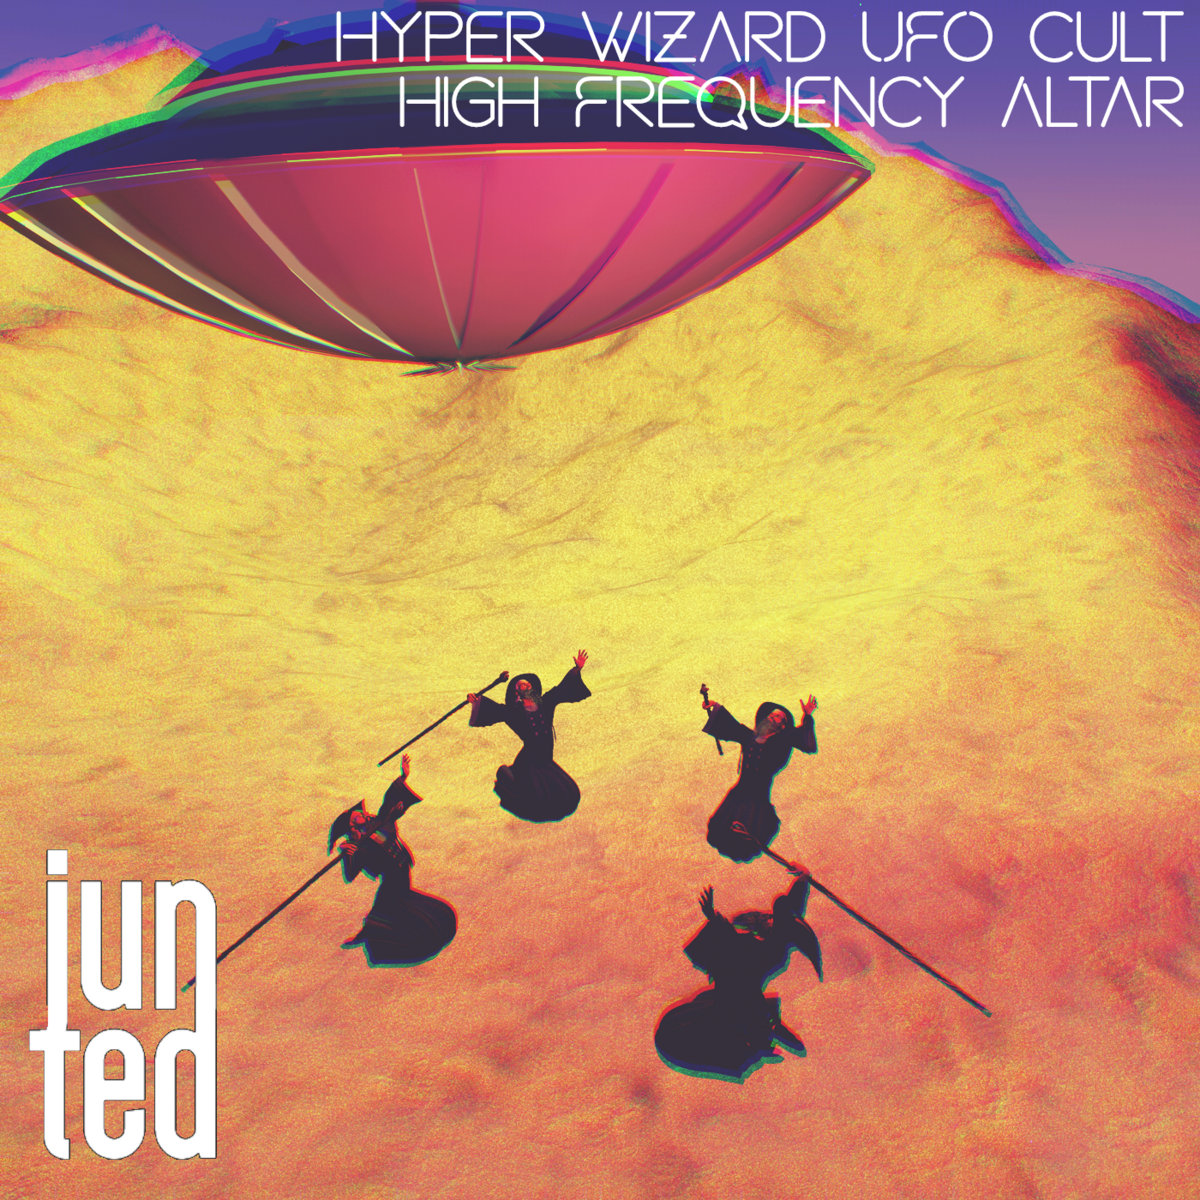 Hyper Wizard UFO Cult – High Frequency Altar